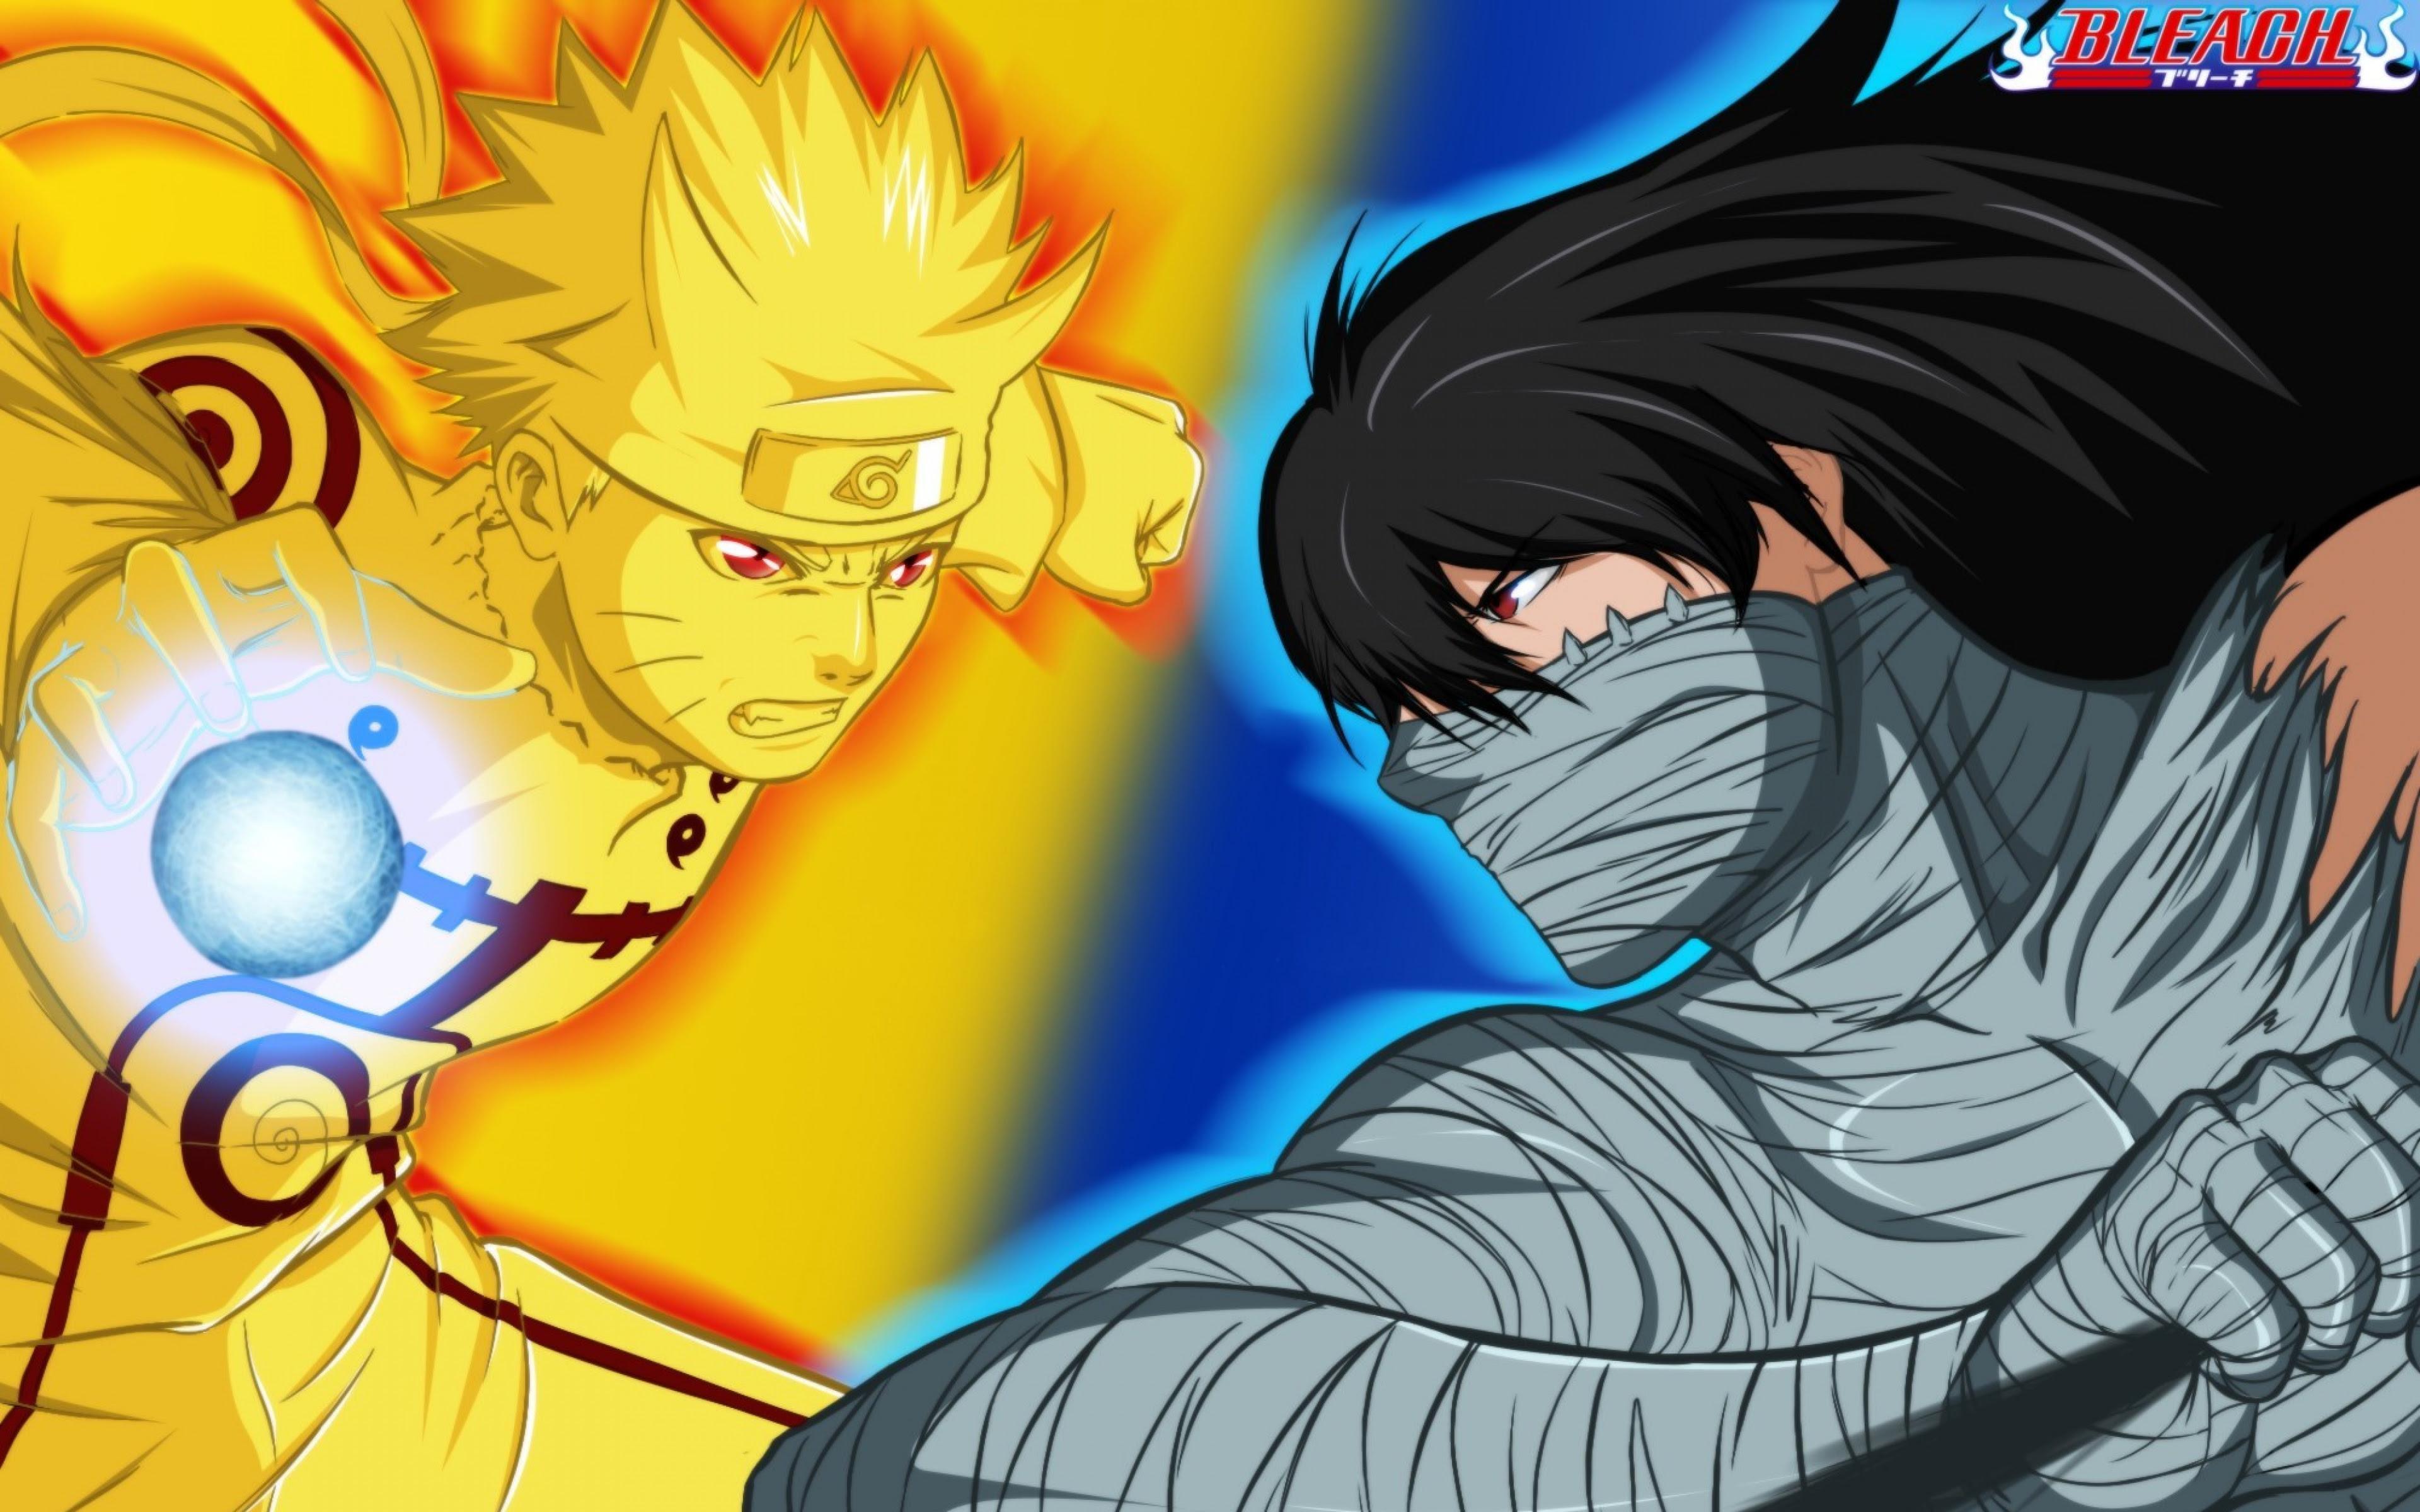 Image Of Naruto Shippuden Wallpaper